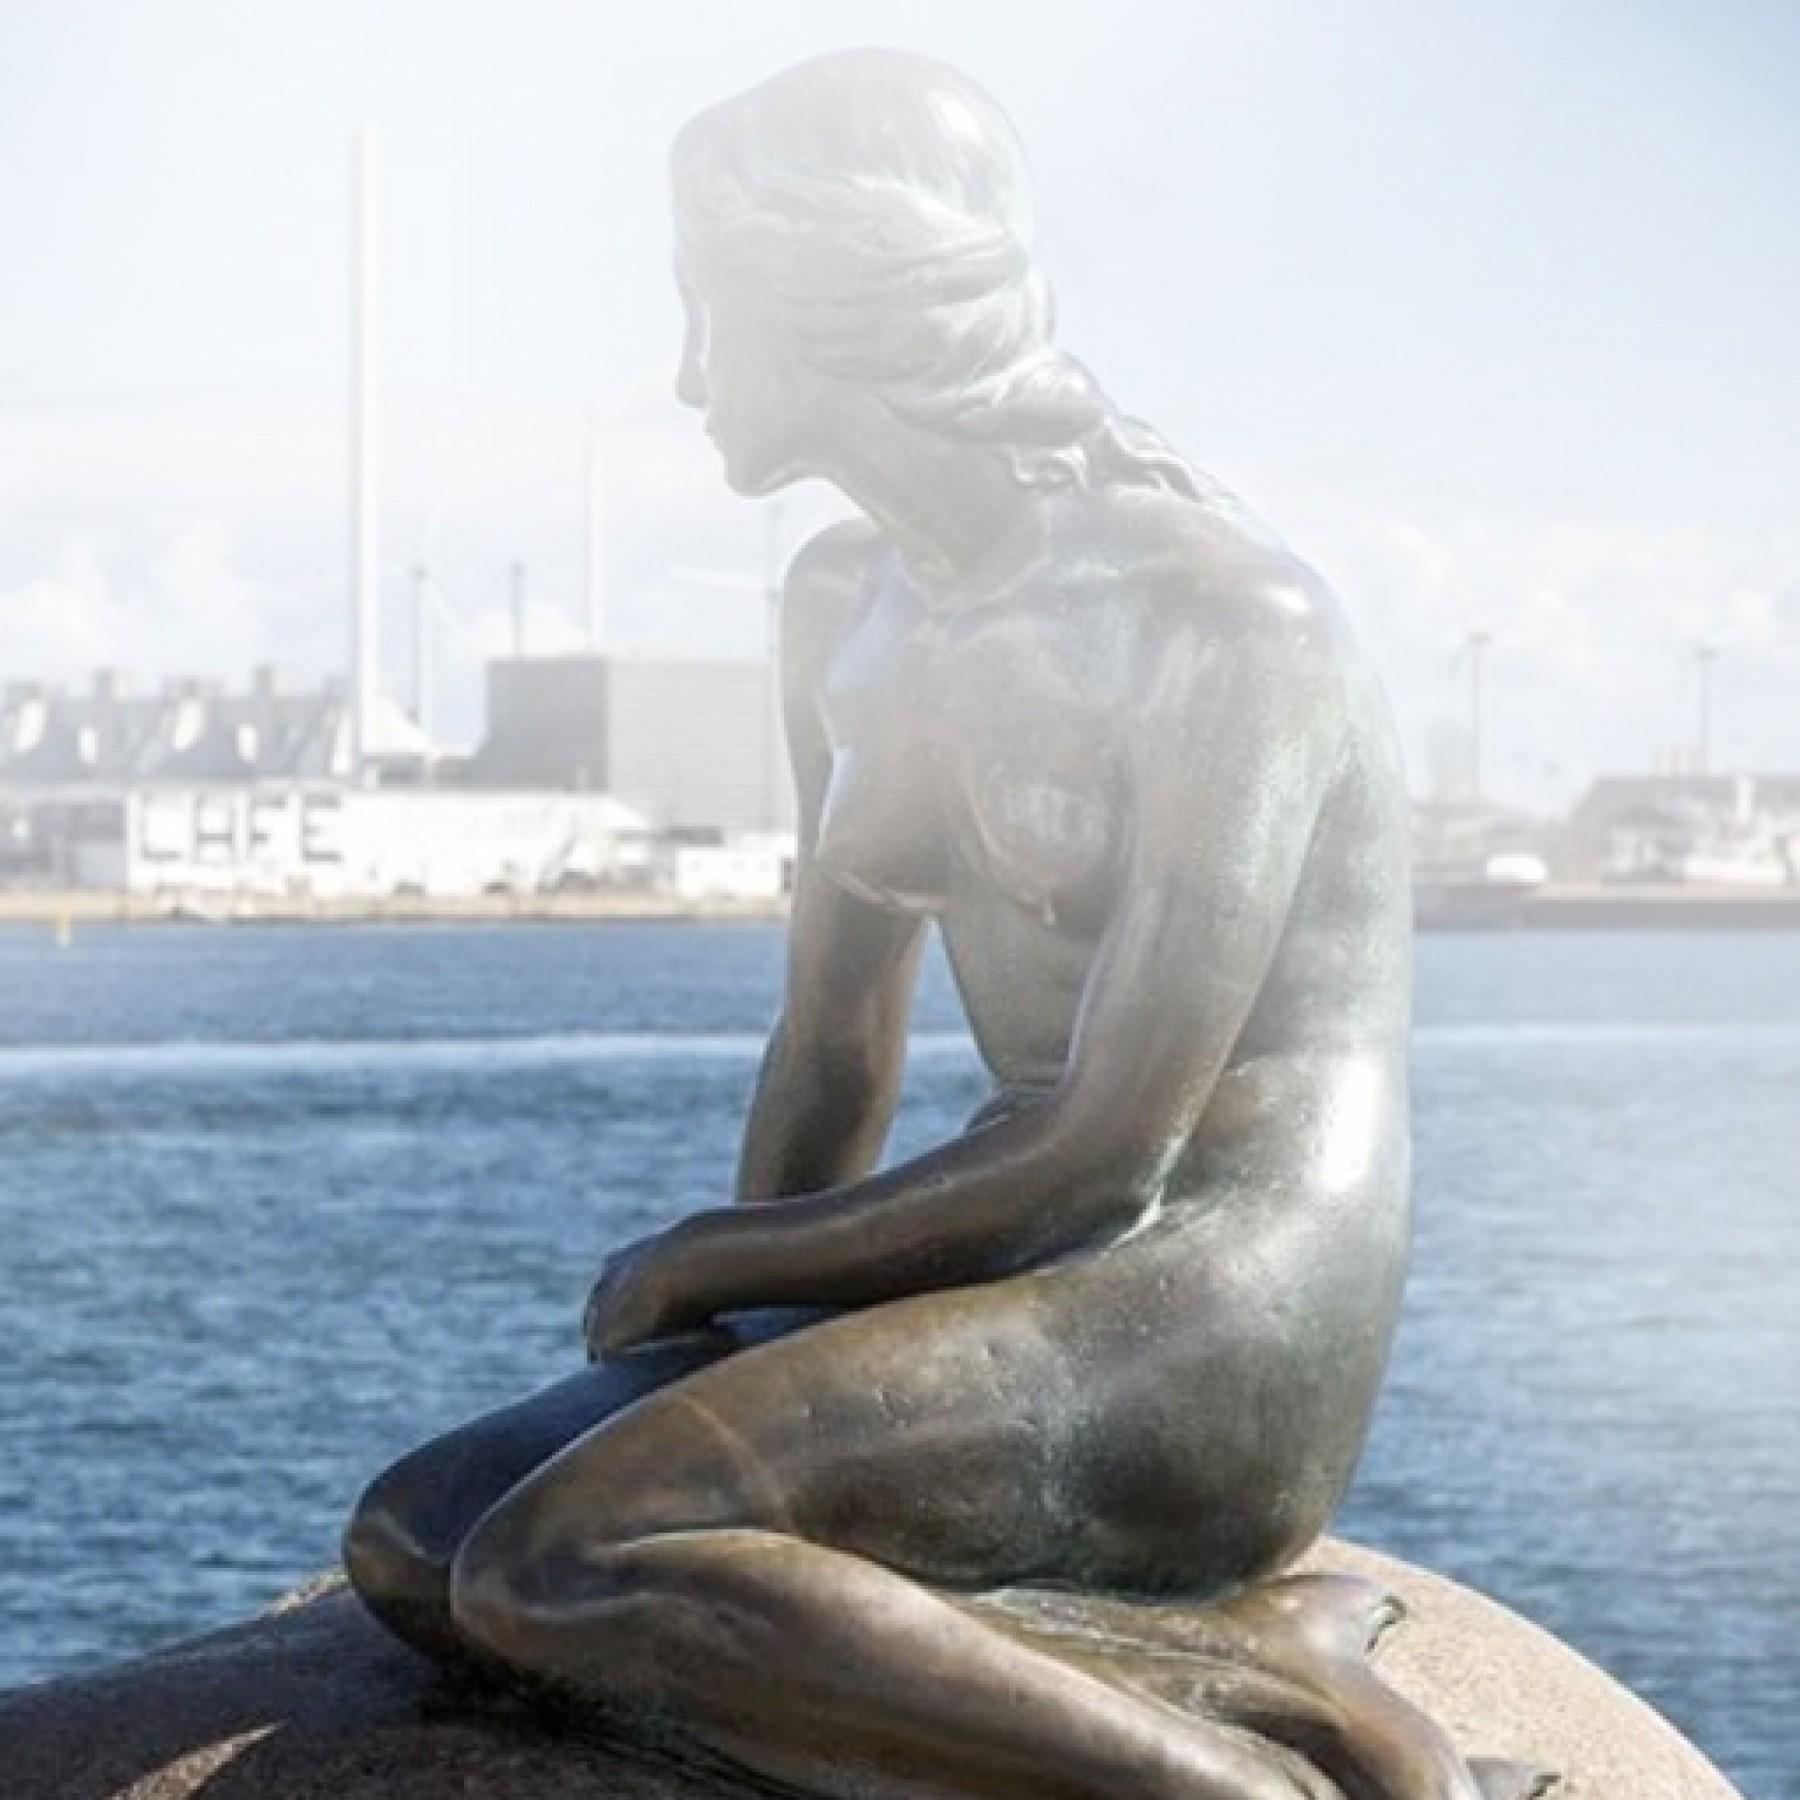 little-mermaid-statue-copenhagen-history-travel-adults-mysterious-main-location